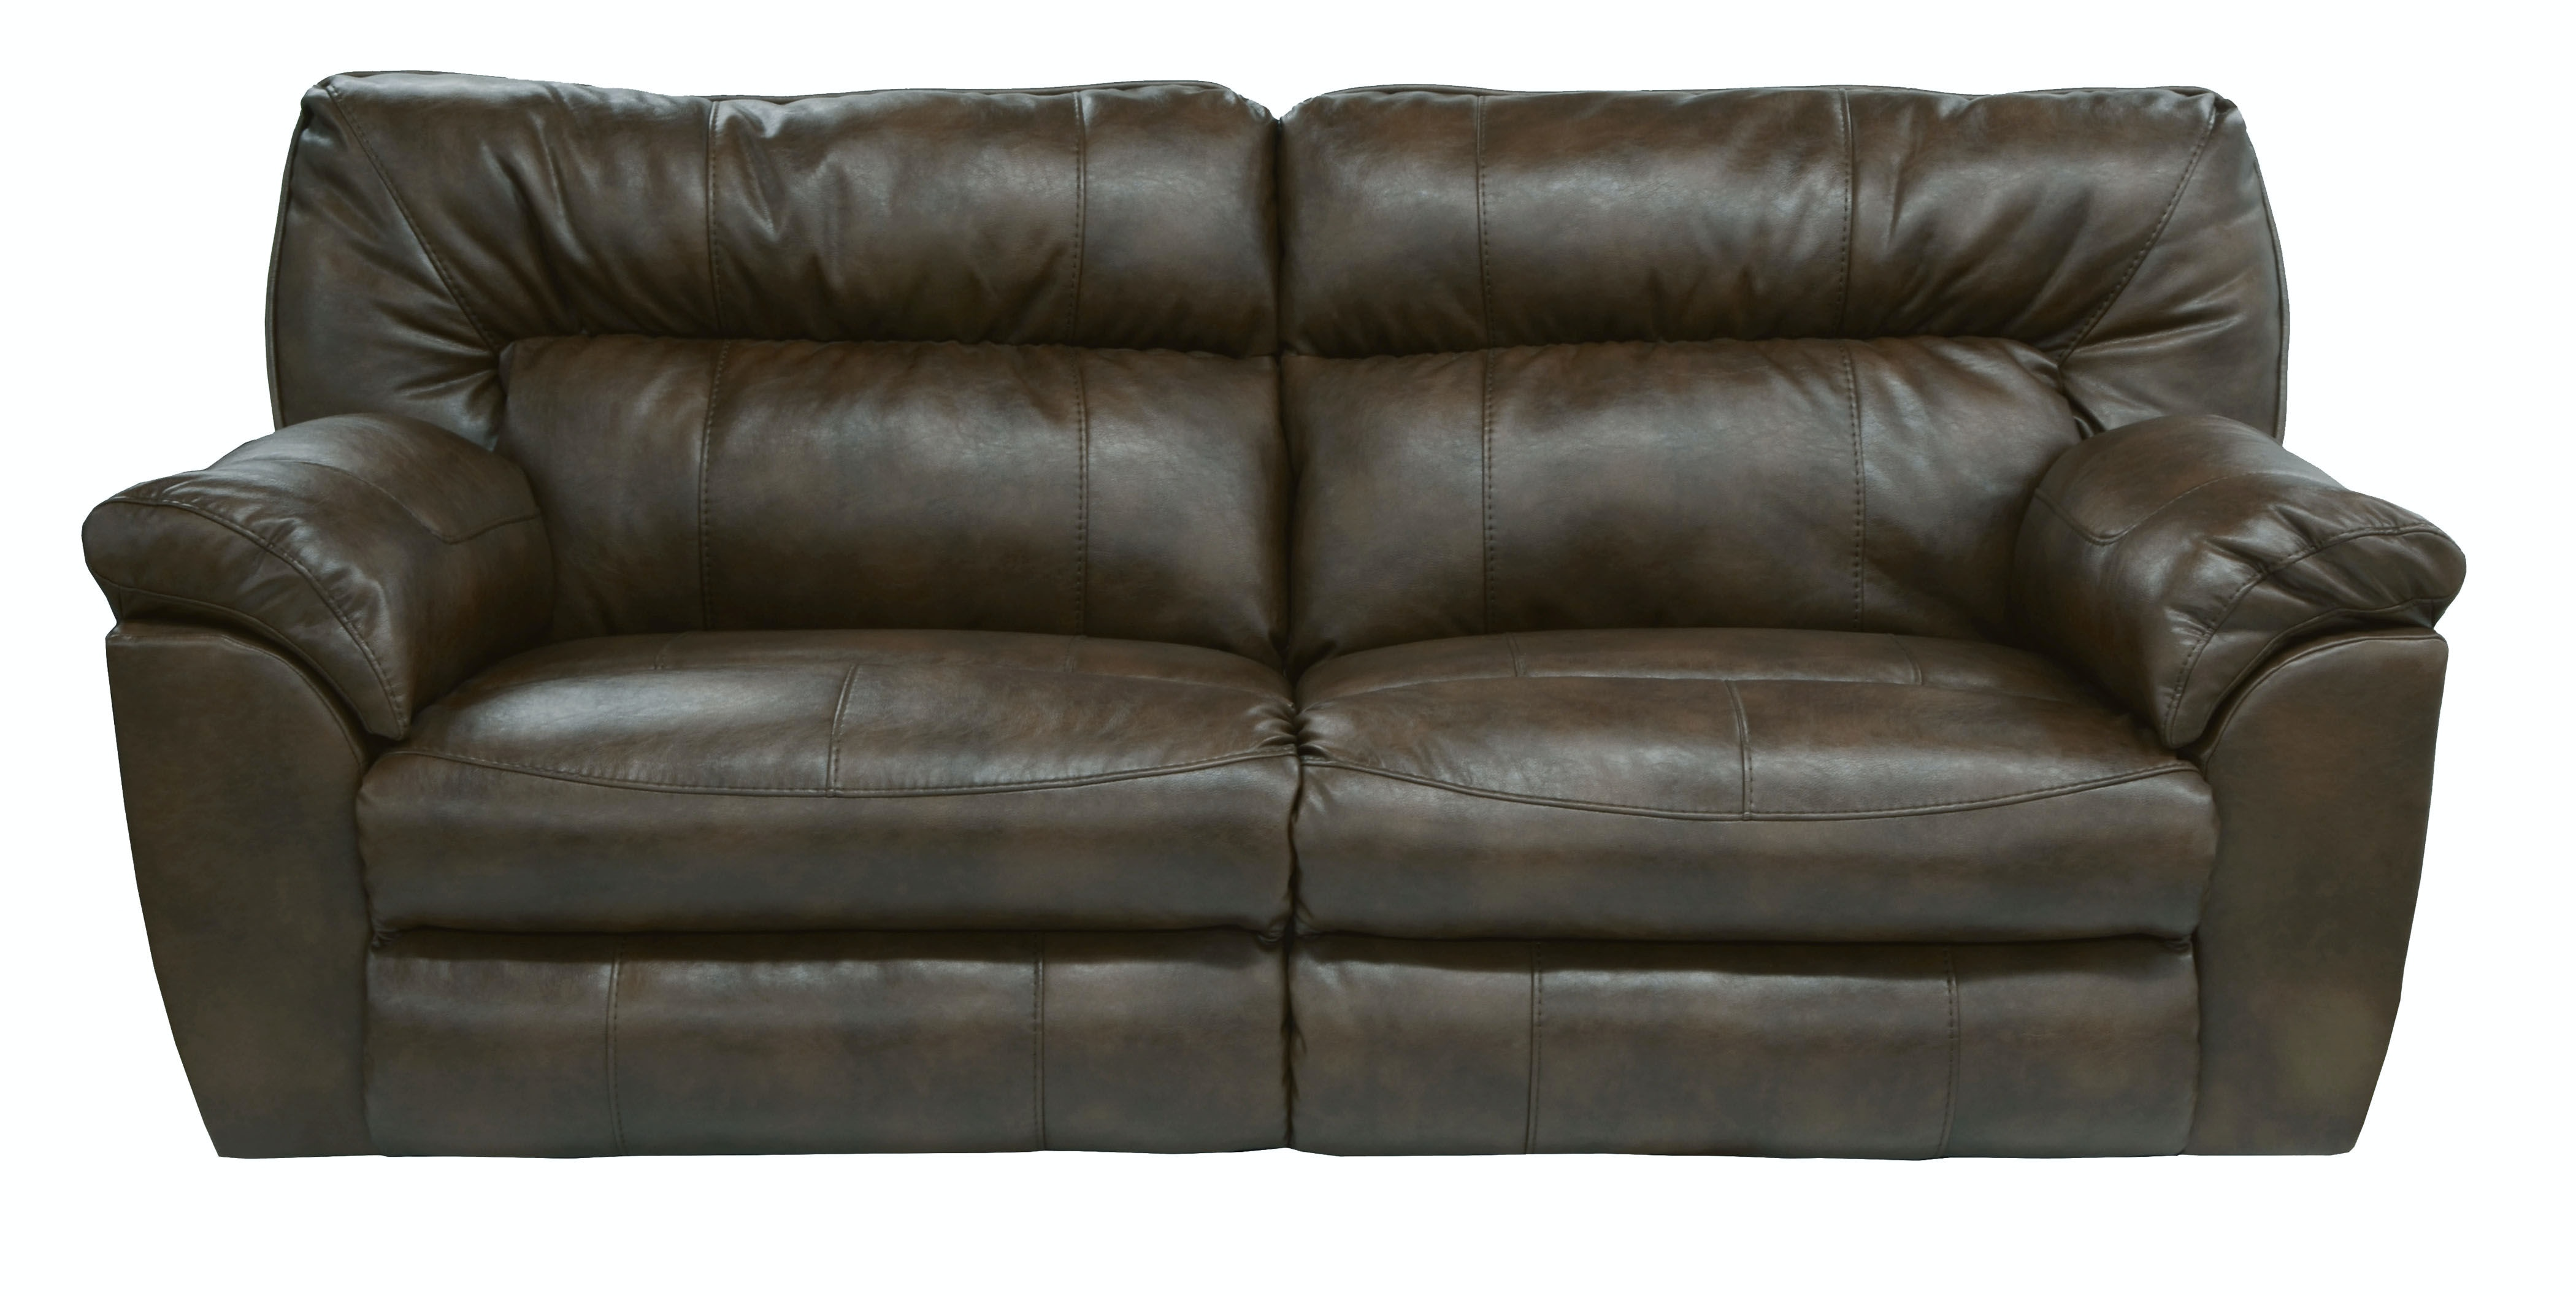 nolan power reclining sofa bedroom furniture catnapper living room extra wide